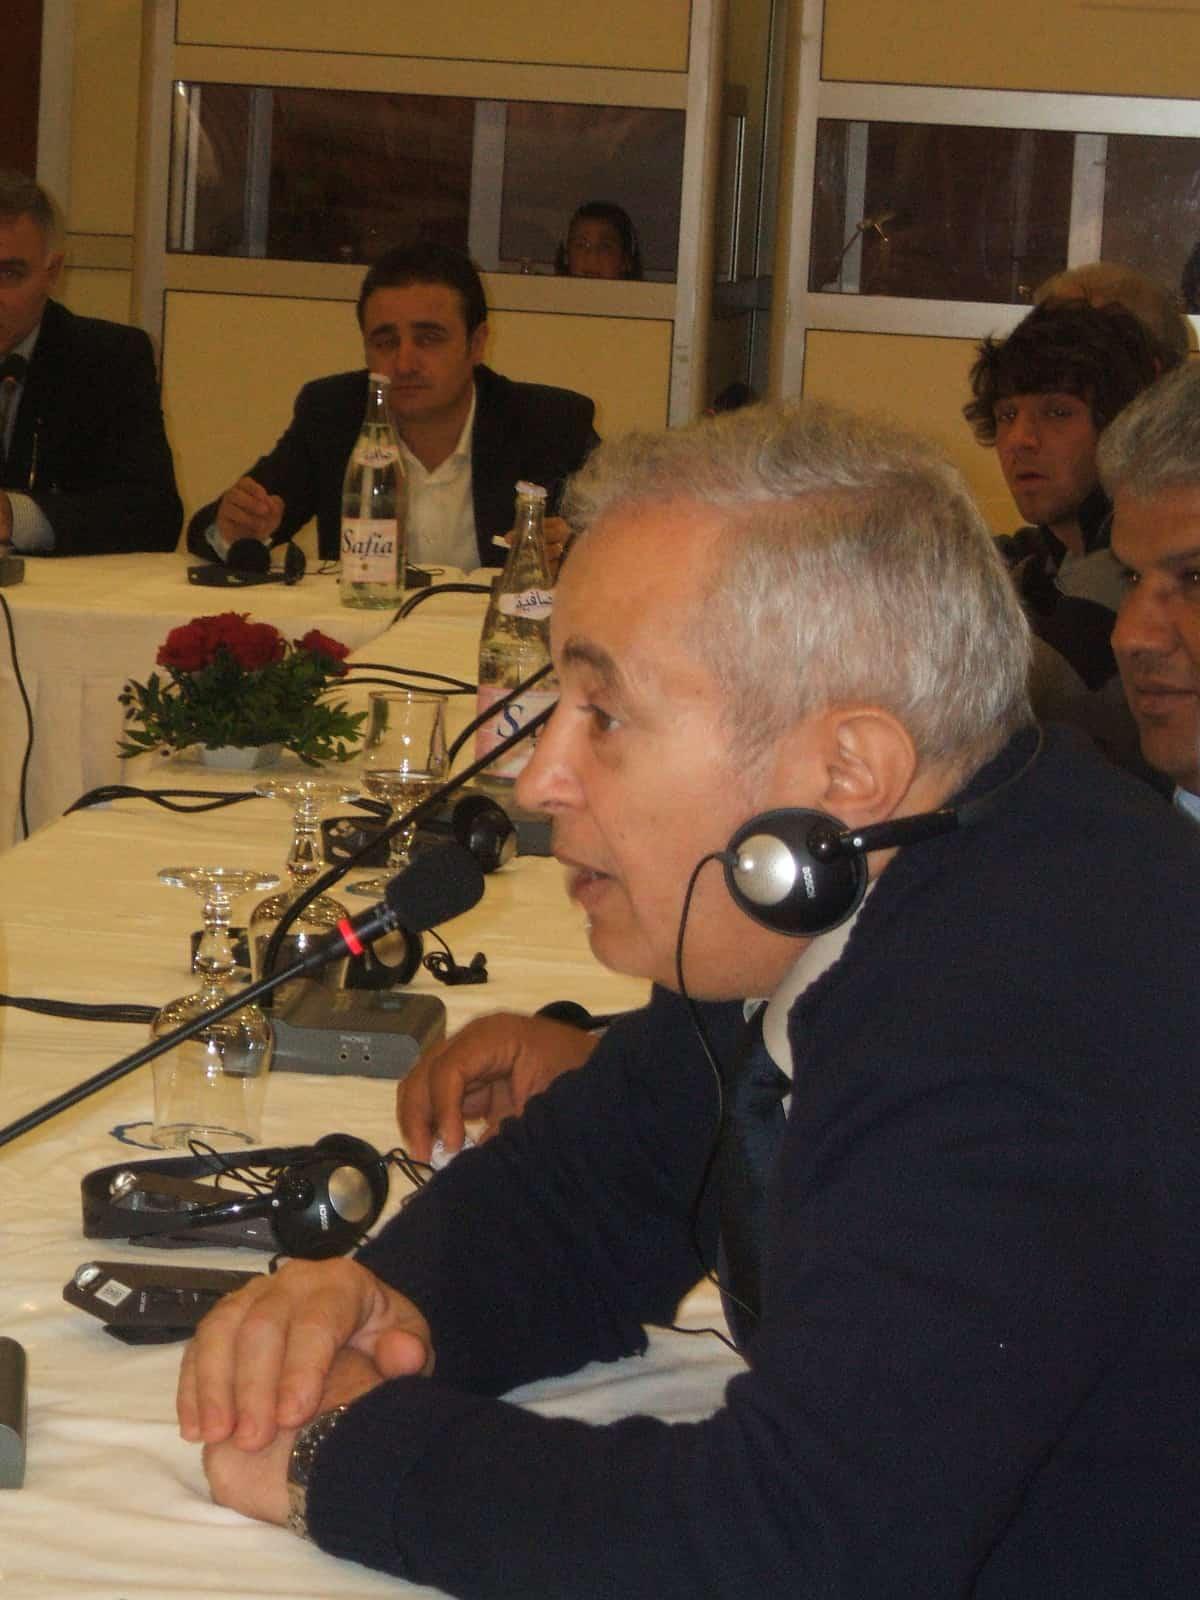 dott-mohamed-nuttah-rappresentante-della-libia